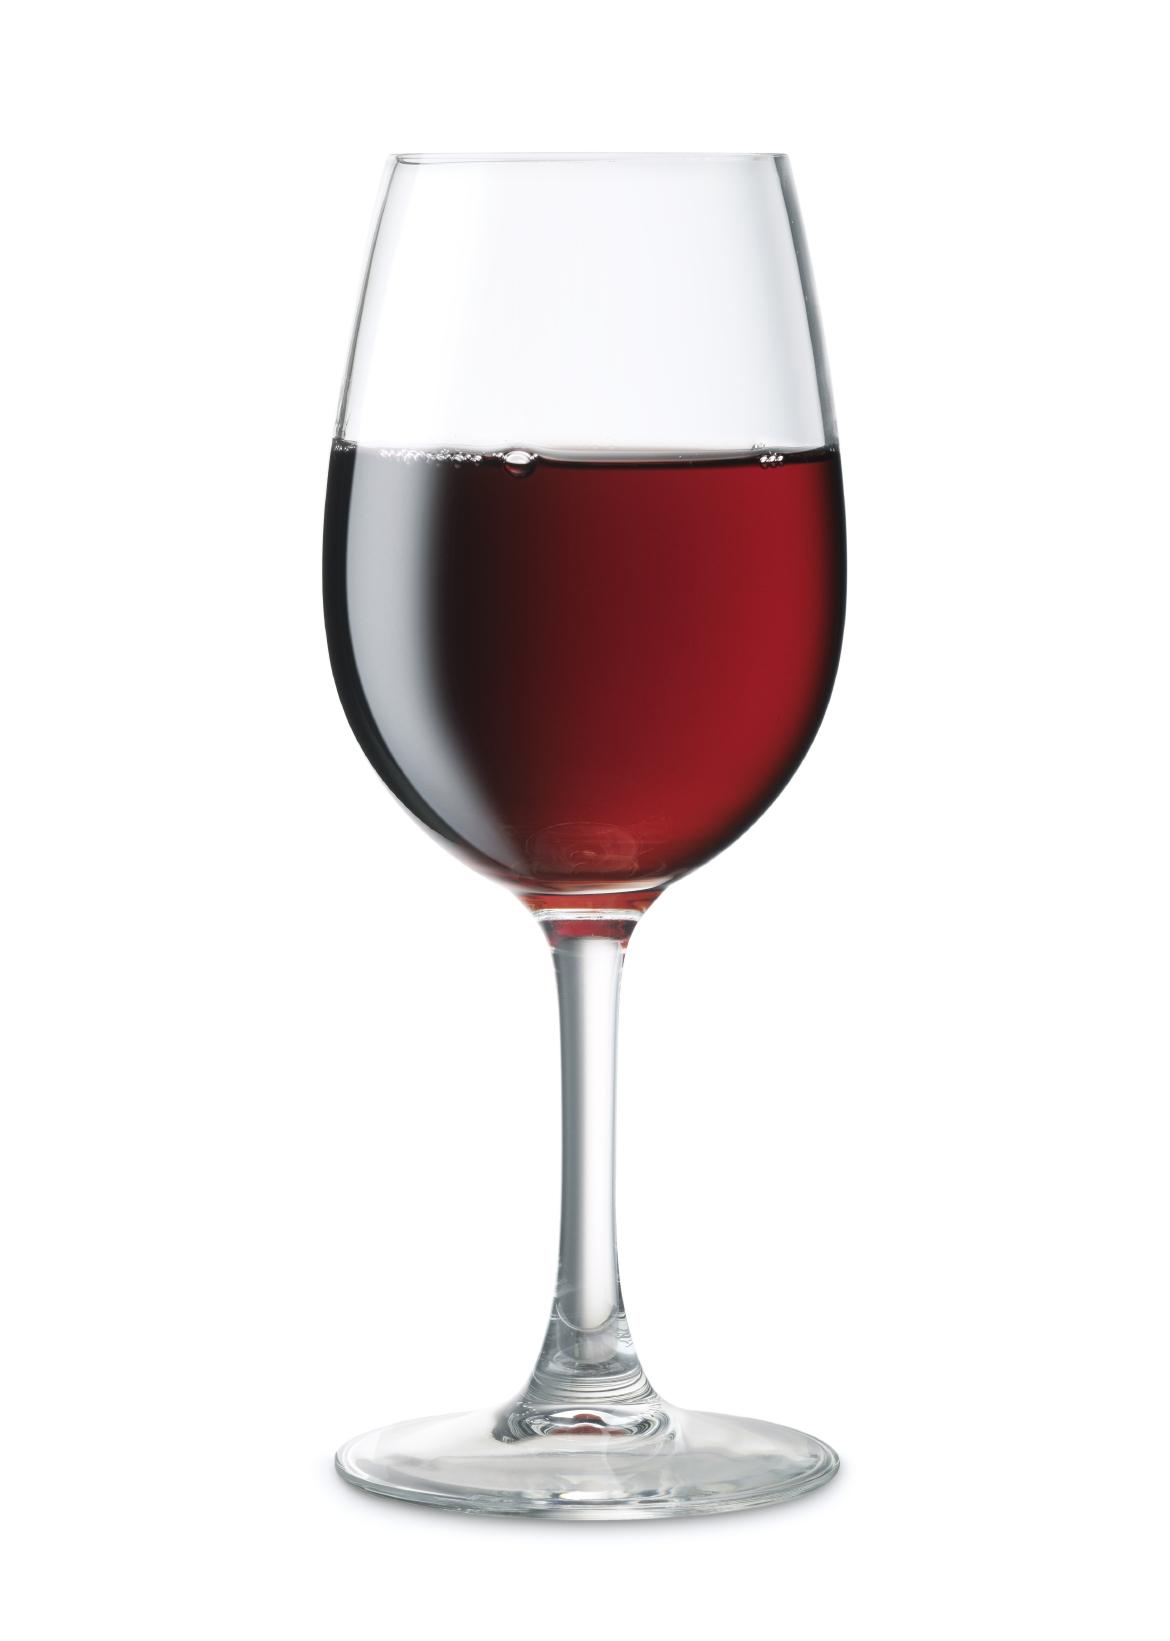 C Mo Eliminar Las Manchas M S Dif Ciles De Tu Hogar Expertos En  ~ Como Quitar Las Manchas De Vino Tinto